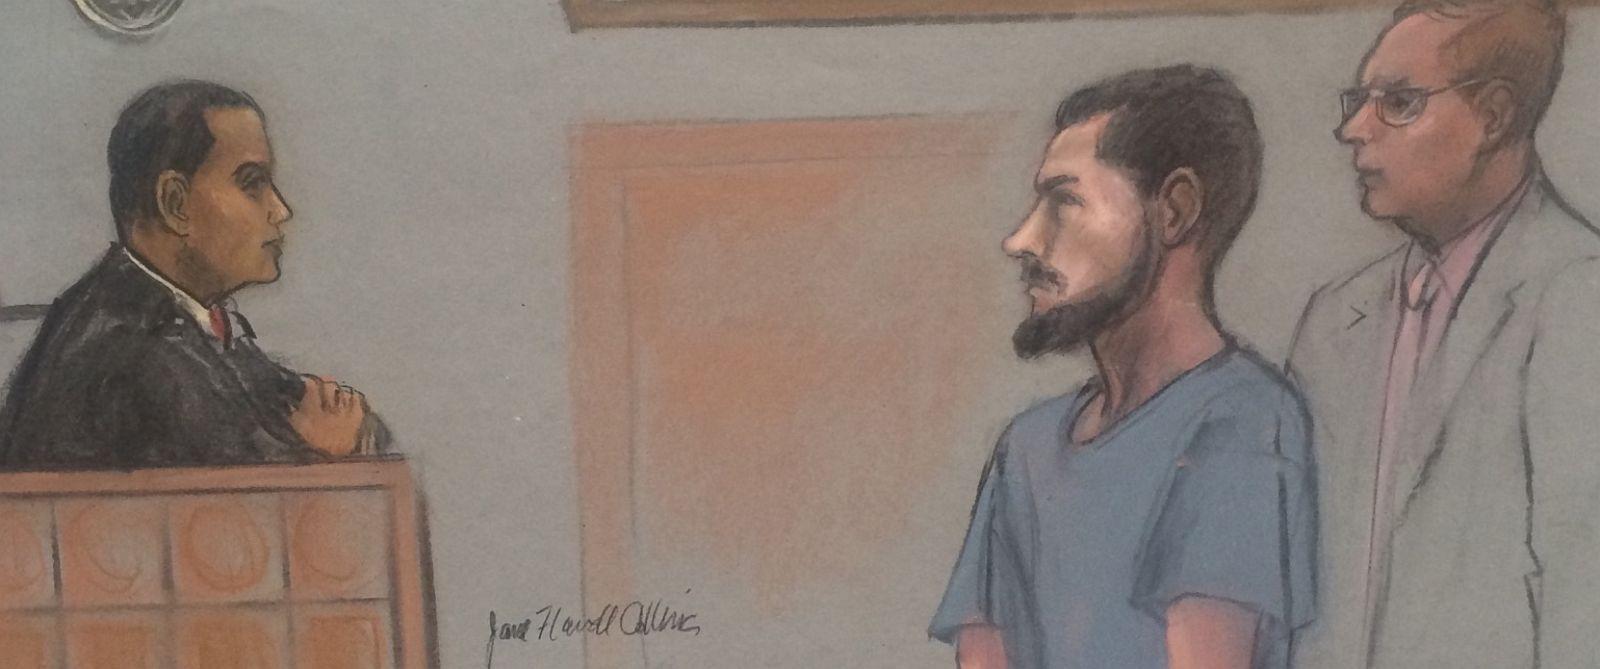 PHOTO: A Sketch of Nicholas Rovinski in court in Boston on June 12, 2015.